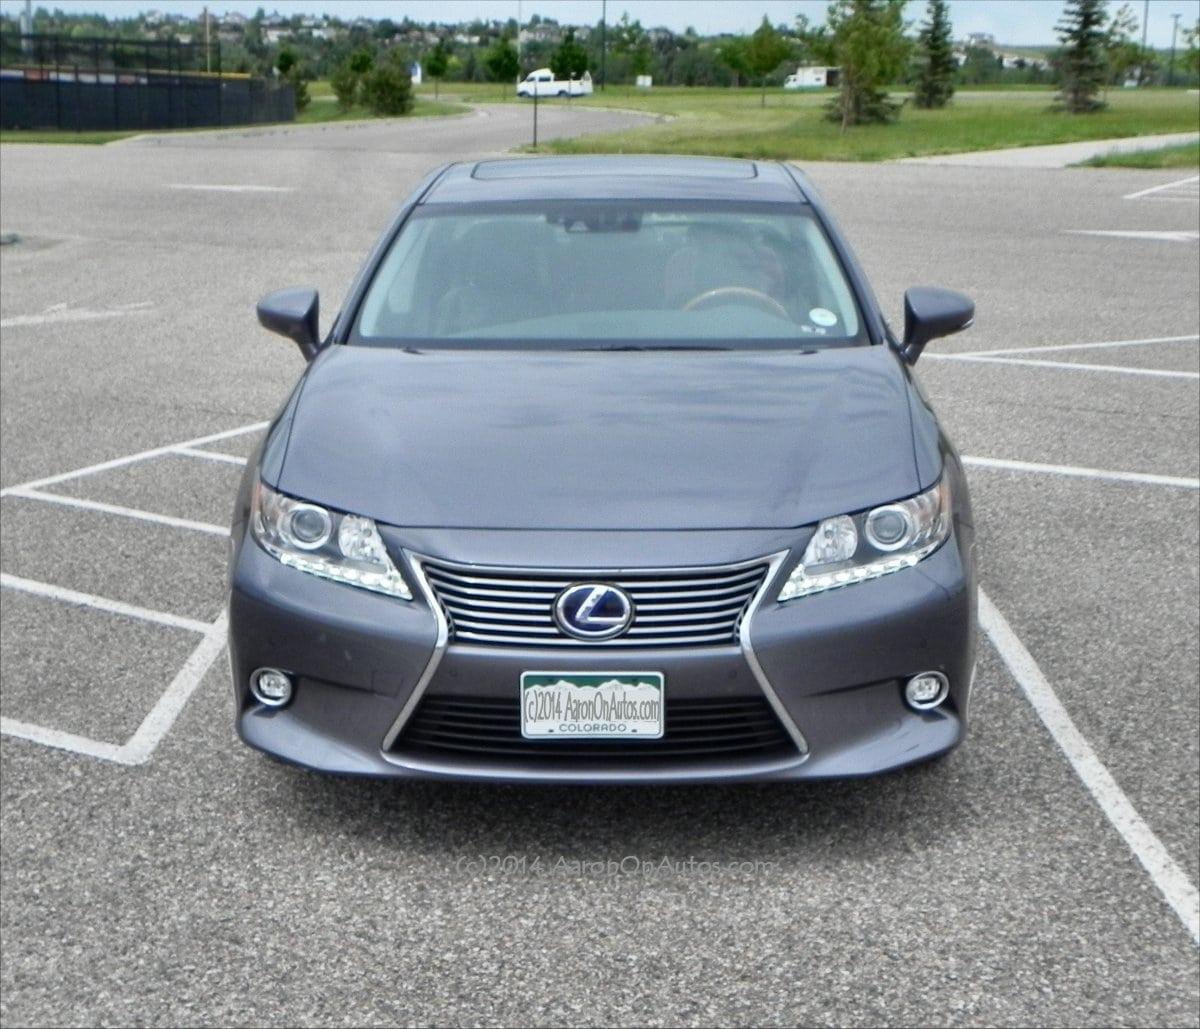 2014 Lexus Es 300h: 2014 Lexus ES 300h Is One Fine Automobile